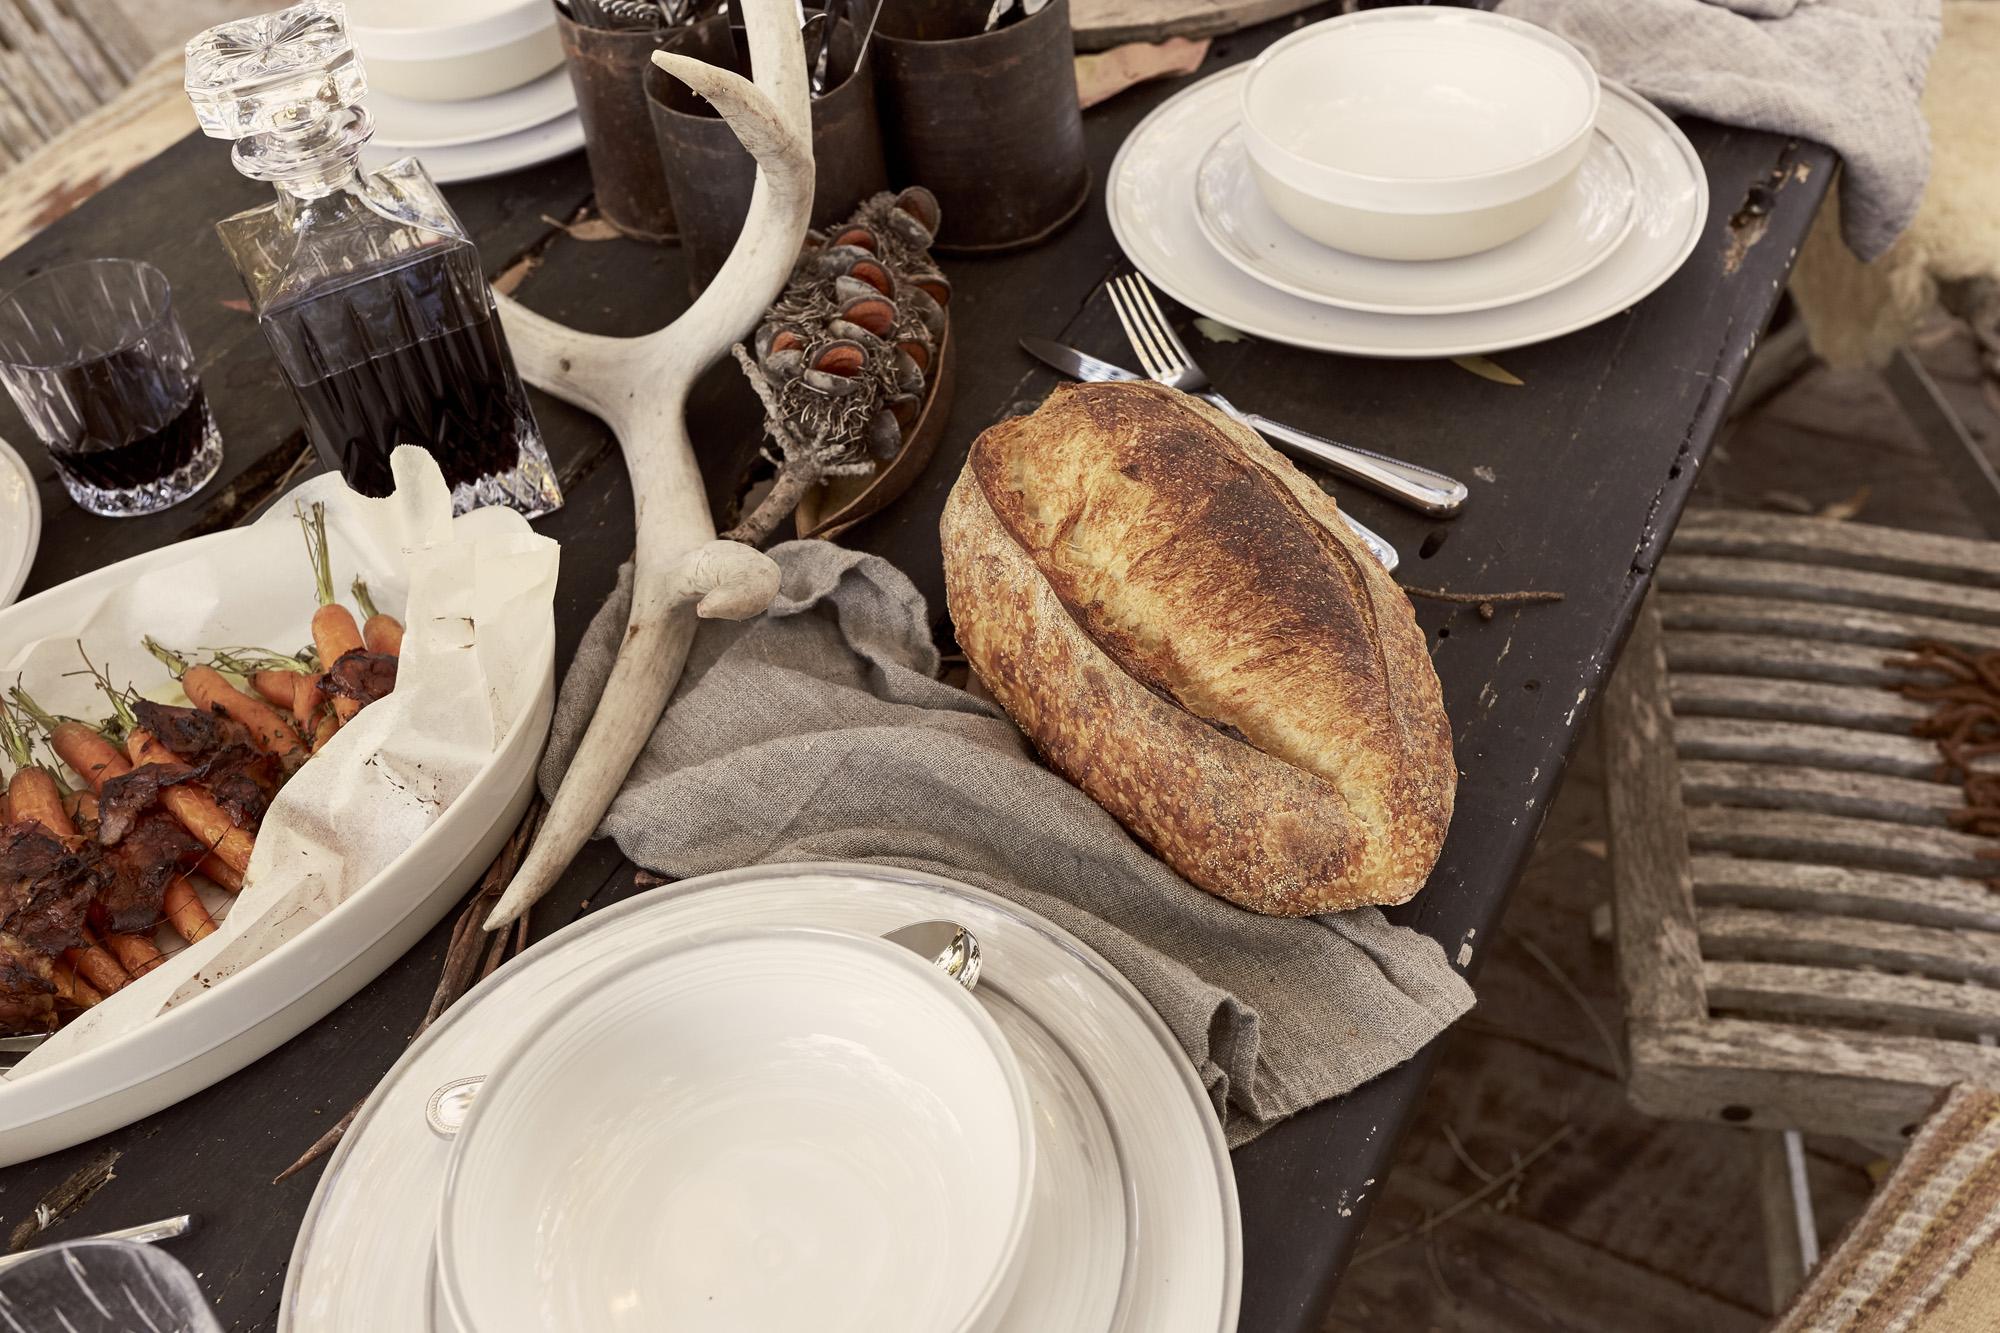 Ellen DeGeneres Royal Doulton CATGK farm feed folk style outdoor eating recipe captain and the gypsy kid